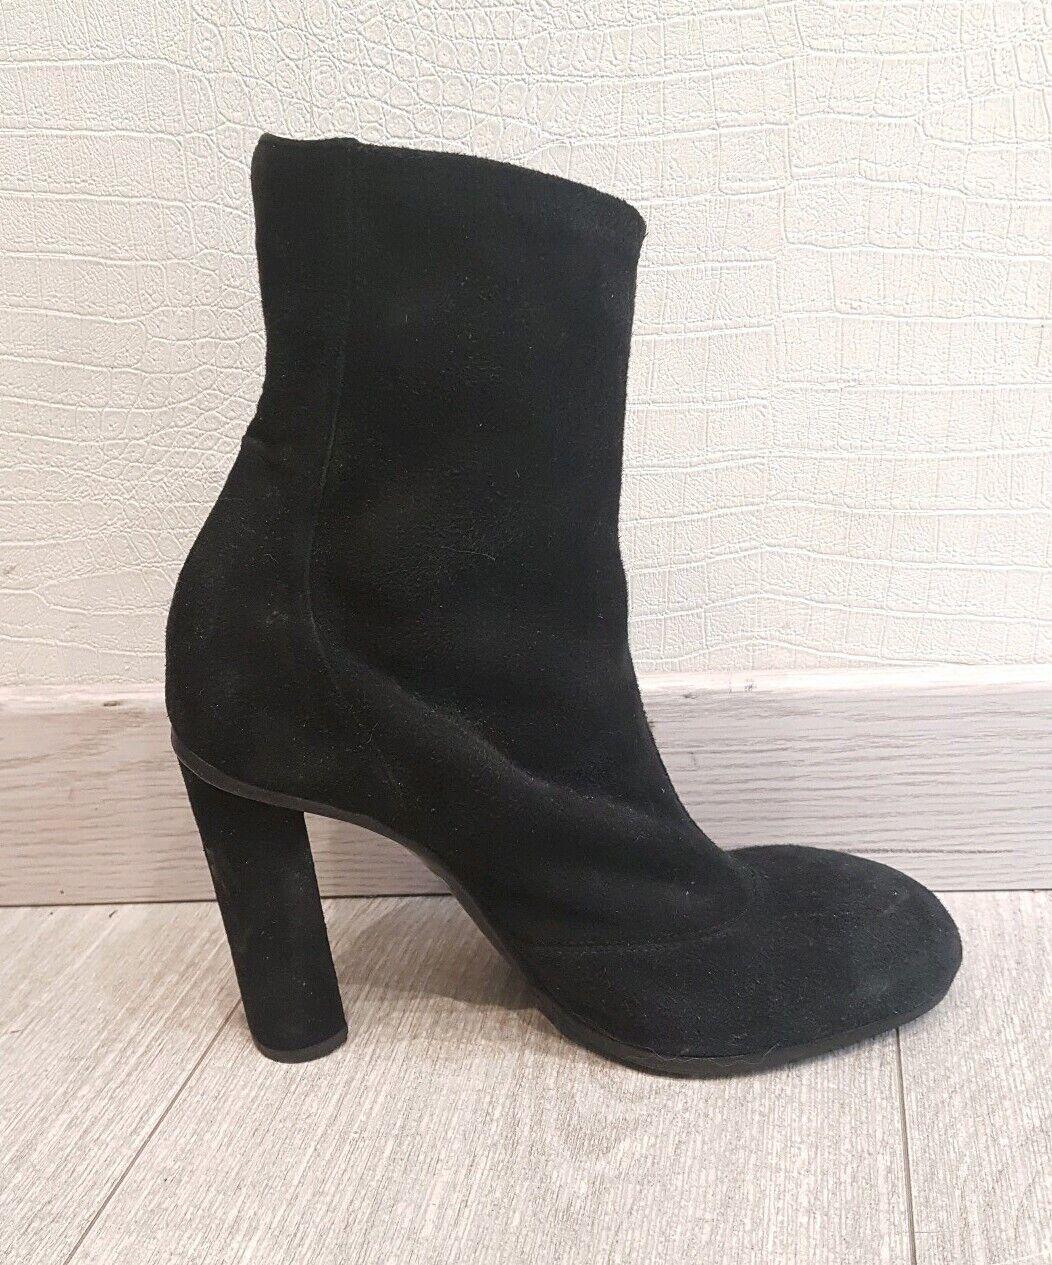 Hermes suede shoes escapins black size 38 hermes shoes 38 heel 10cm